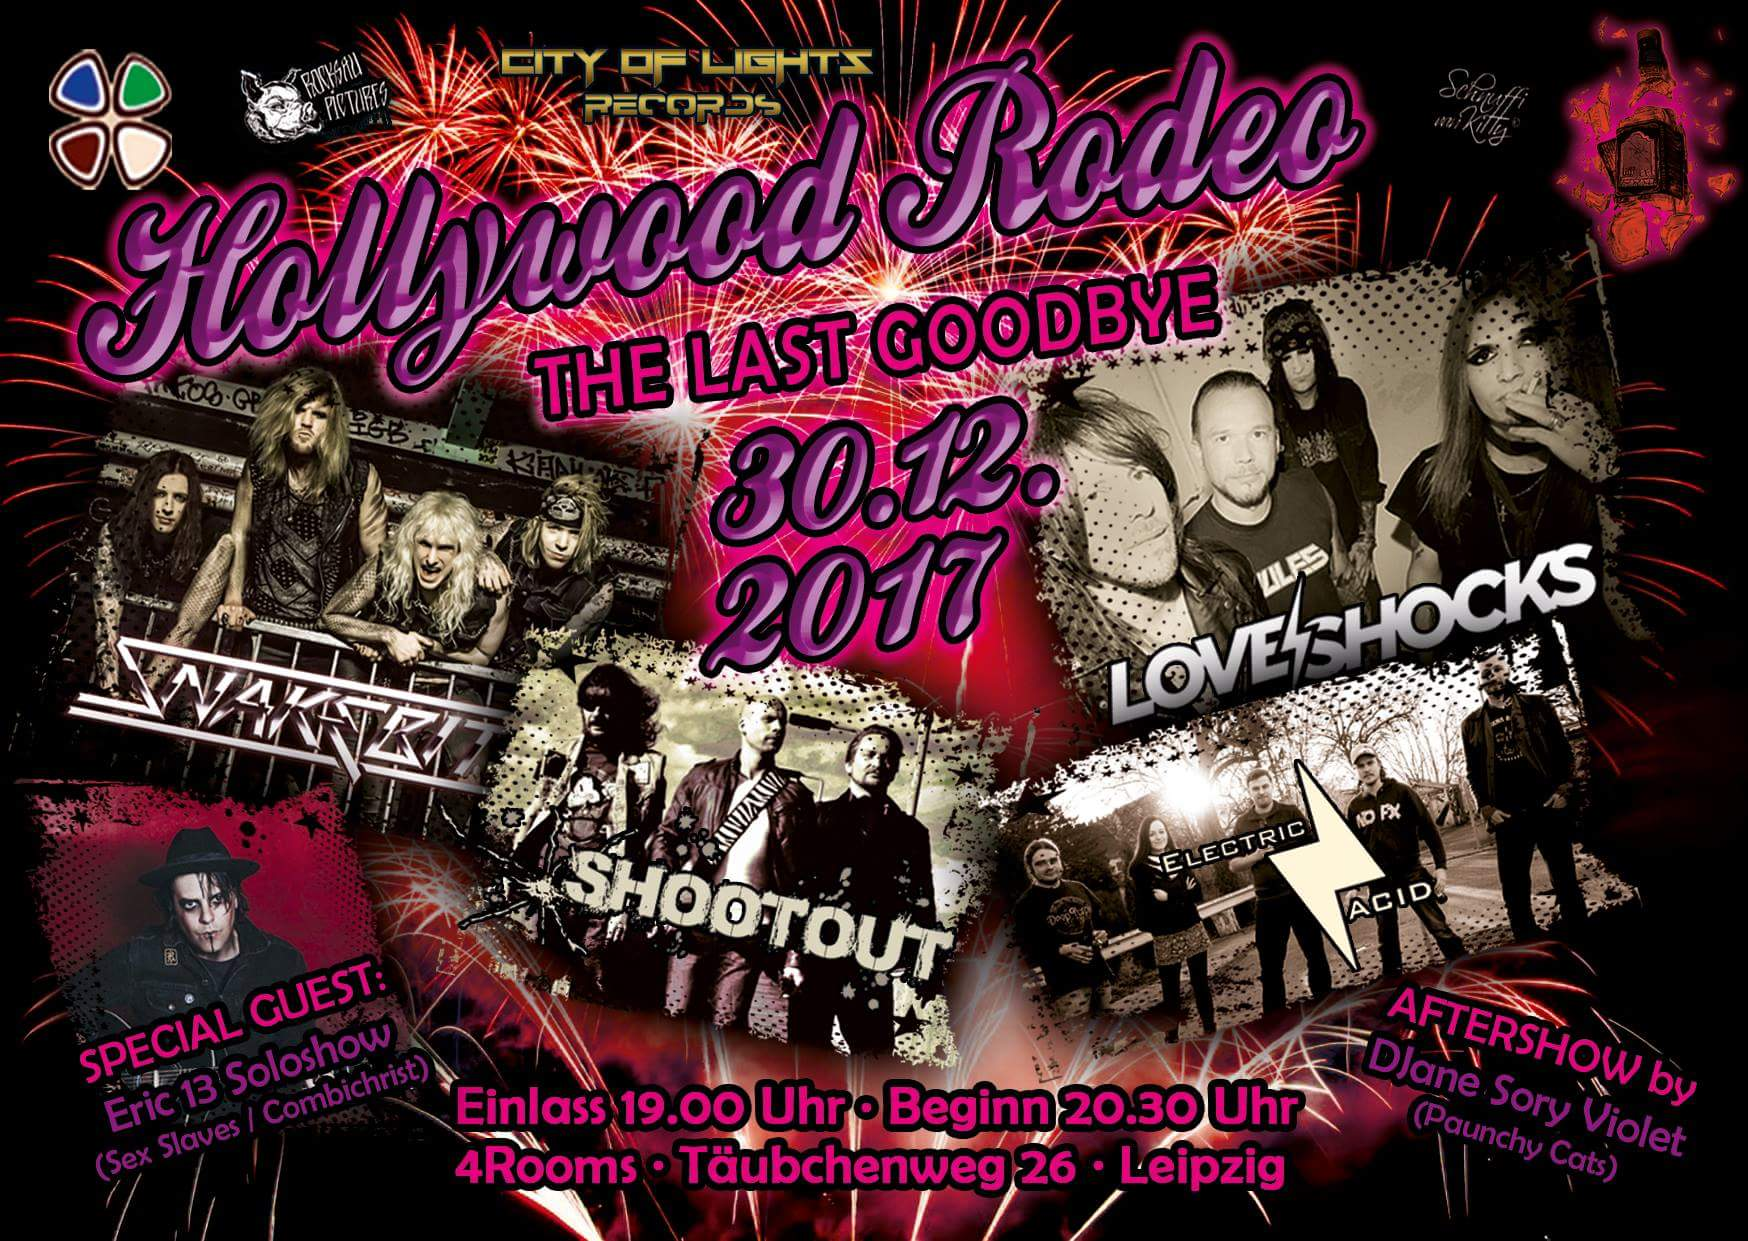 hollywood_rodeo_plakat